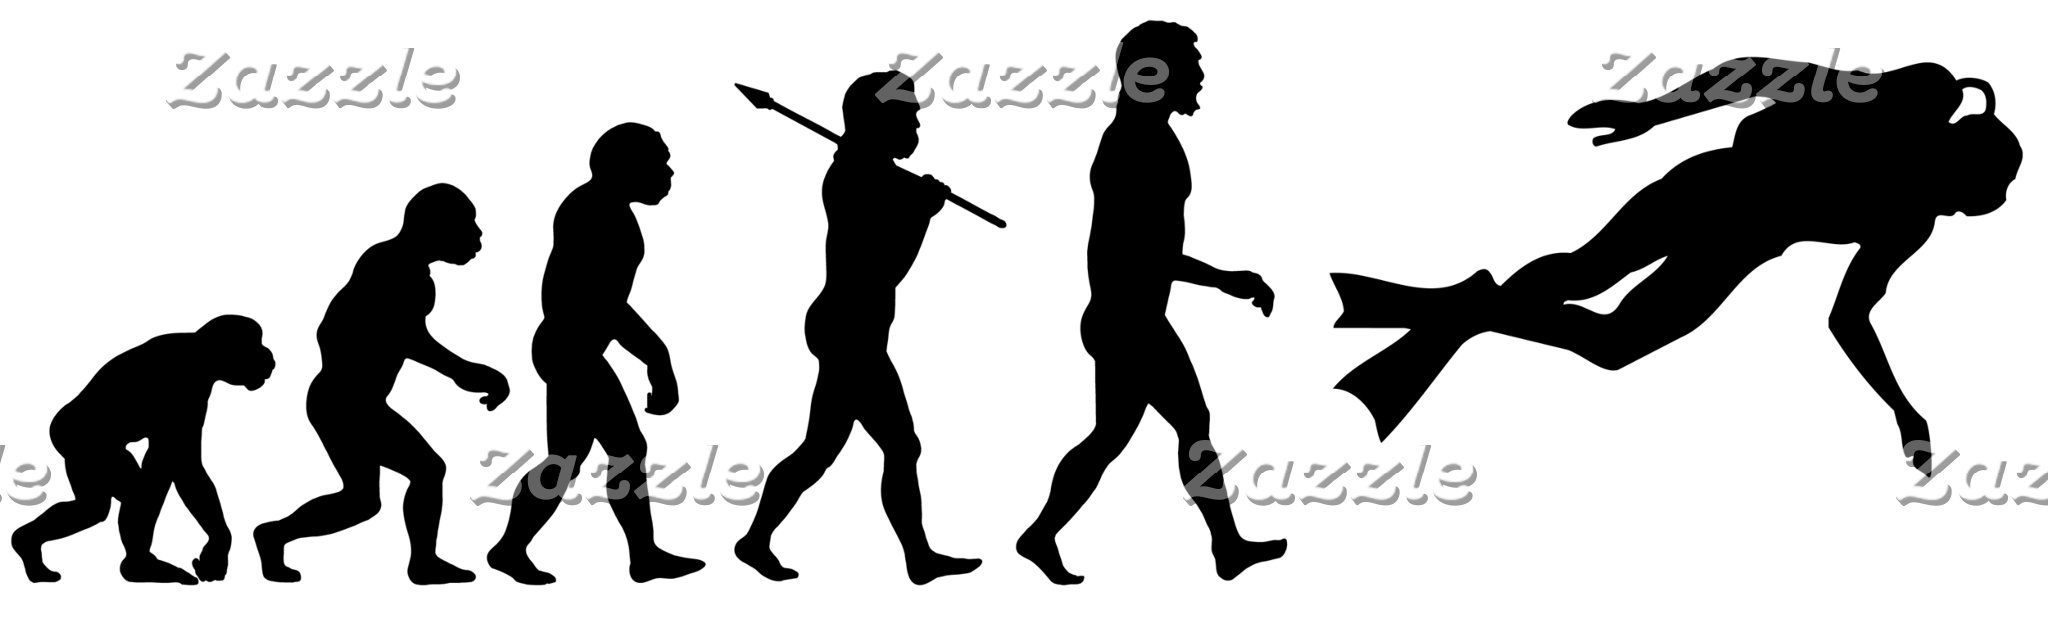 Evolution 3 ~ of Man Sports Hobbies Jobs